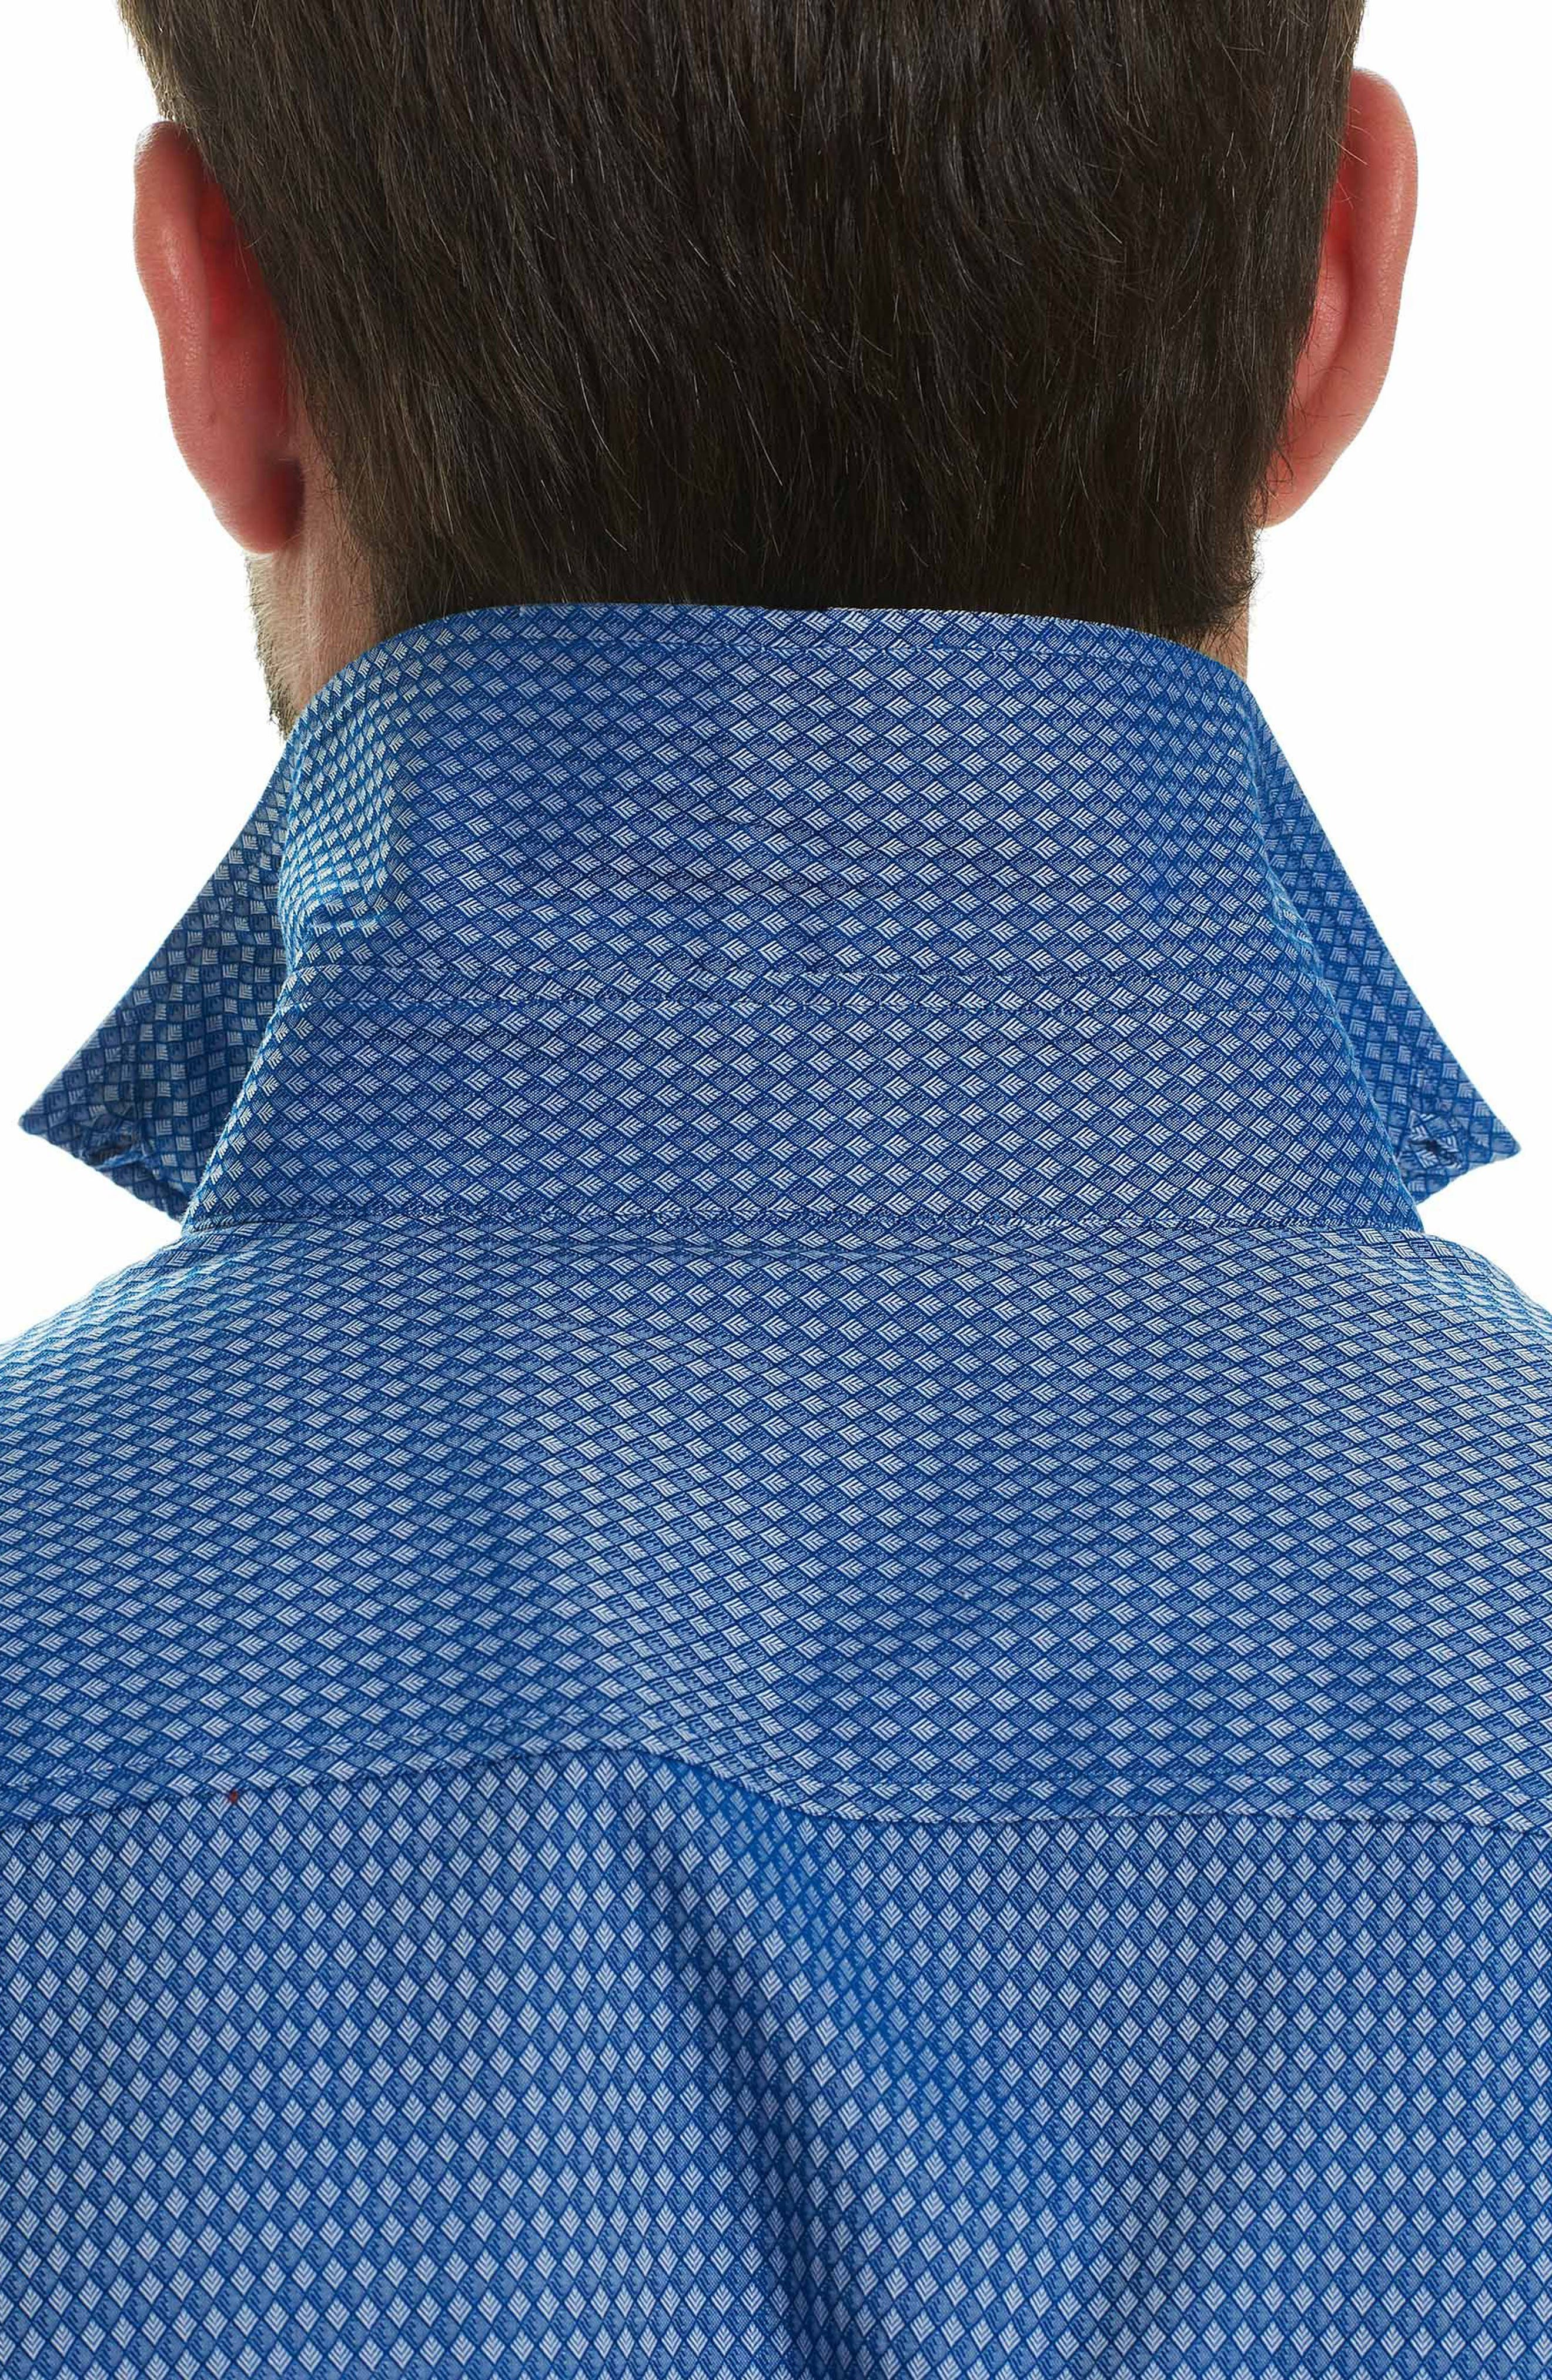 Matthew Tailored Fit Print Sport Shirt,                             Alternate thumbnail 3, color,                             410